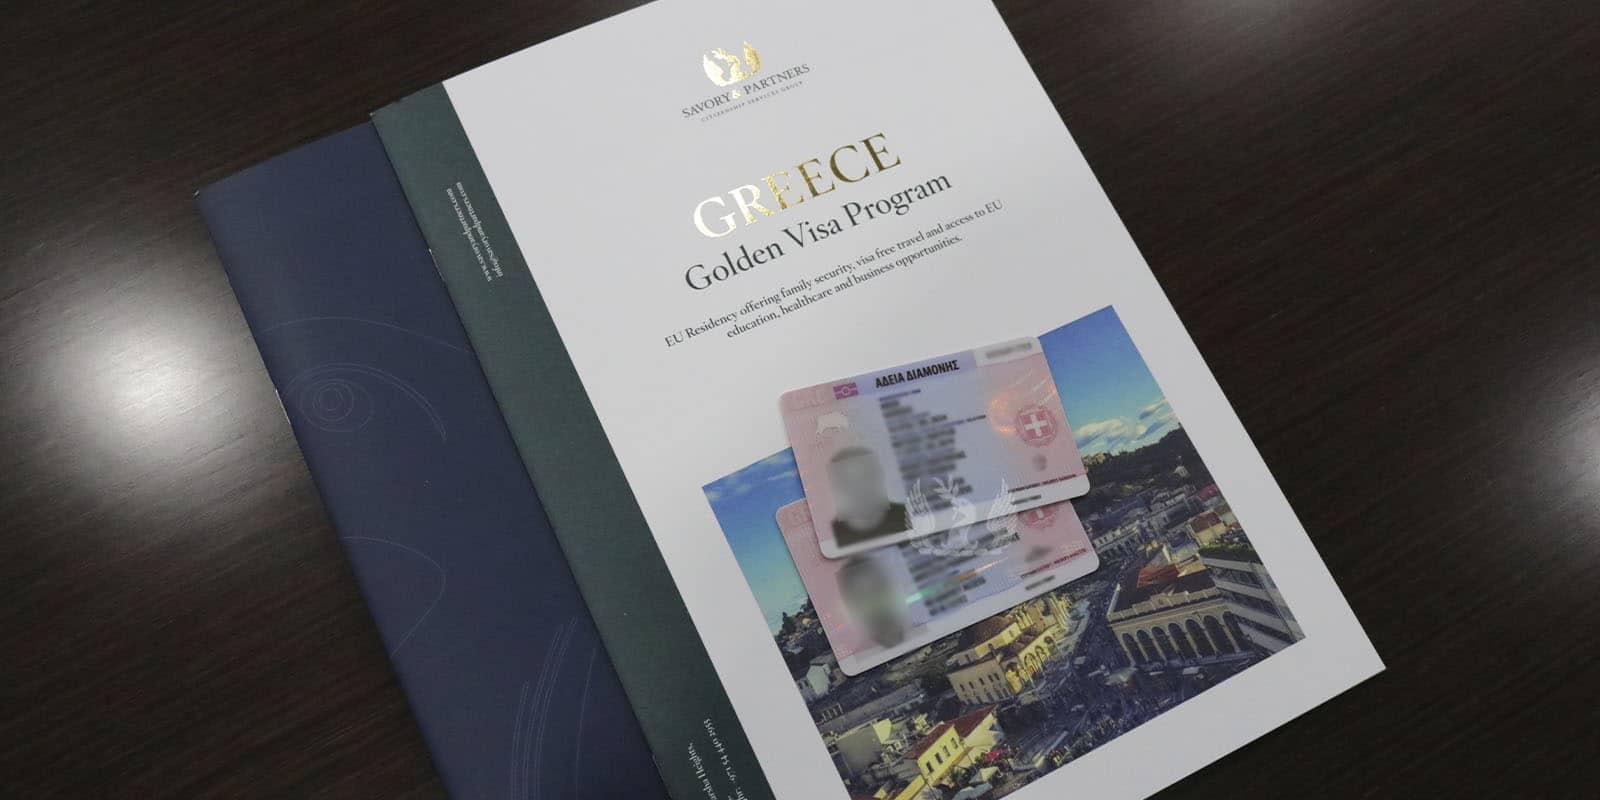 Greece Golden Visa - Savory & Partners, Dubai - UAE